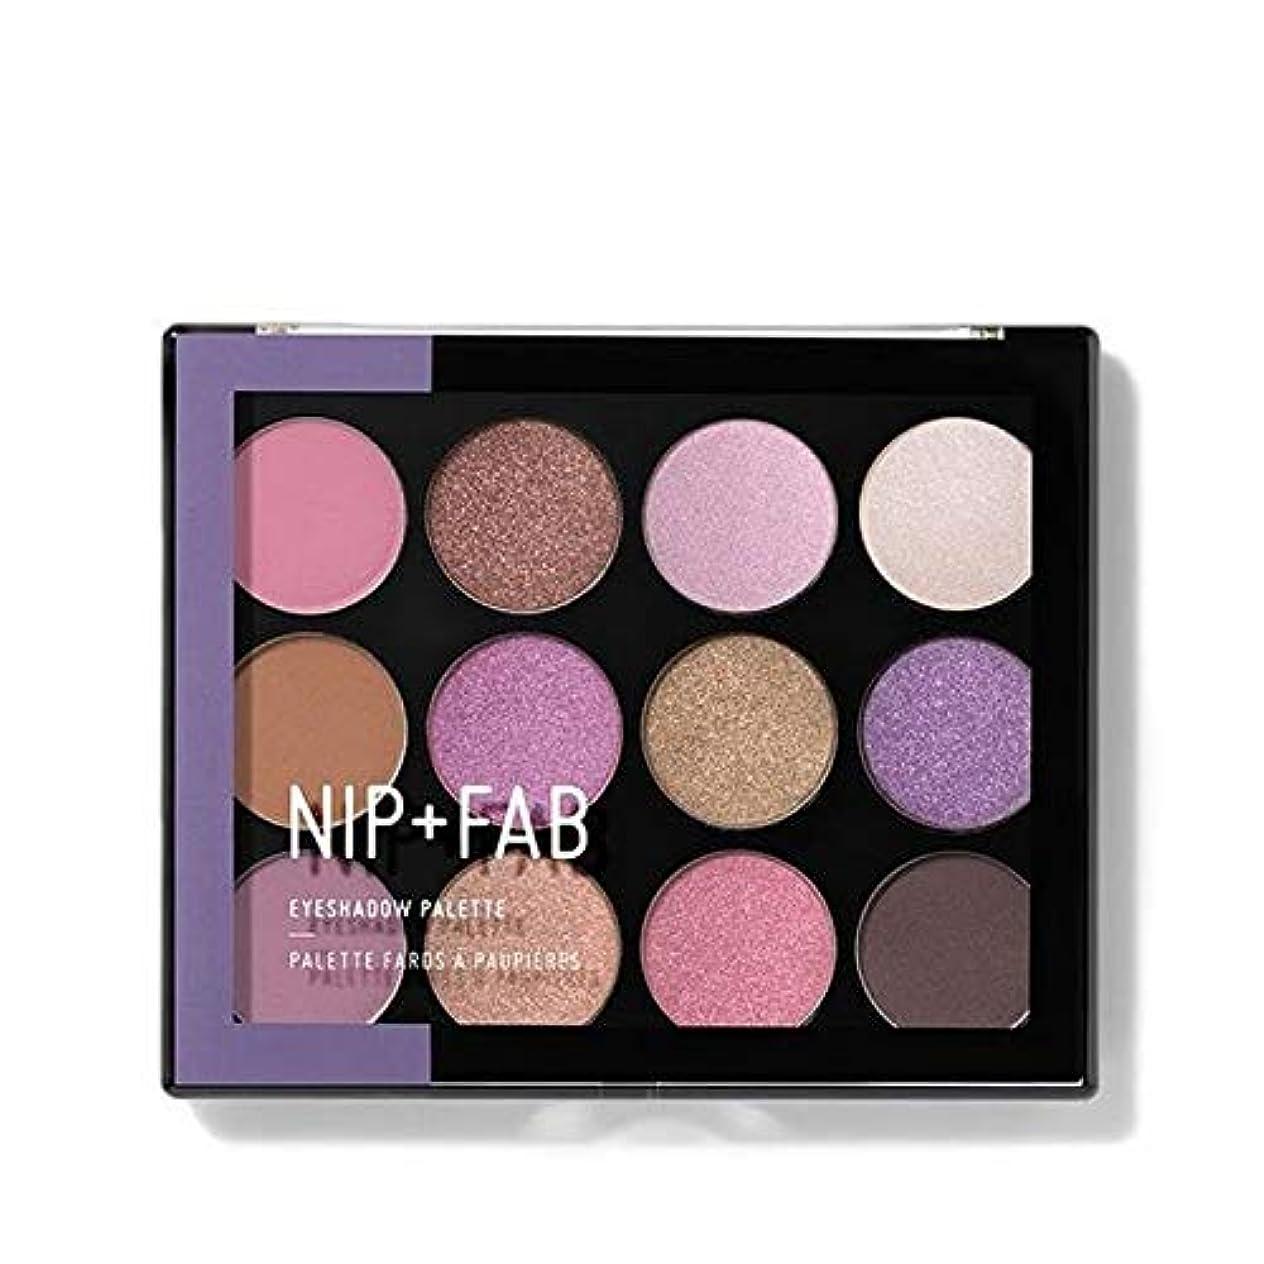 [Nip & Fab ] アイシャドウパレット5を構成するFab +ニップ - NIP+FAB Make Up Eyeshadow Palette 5 [並行輸入品]